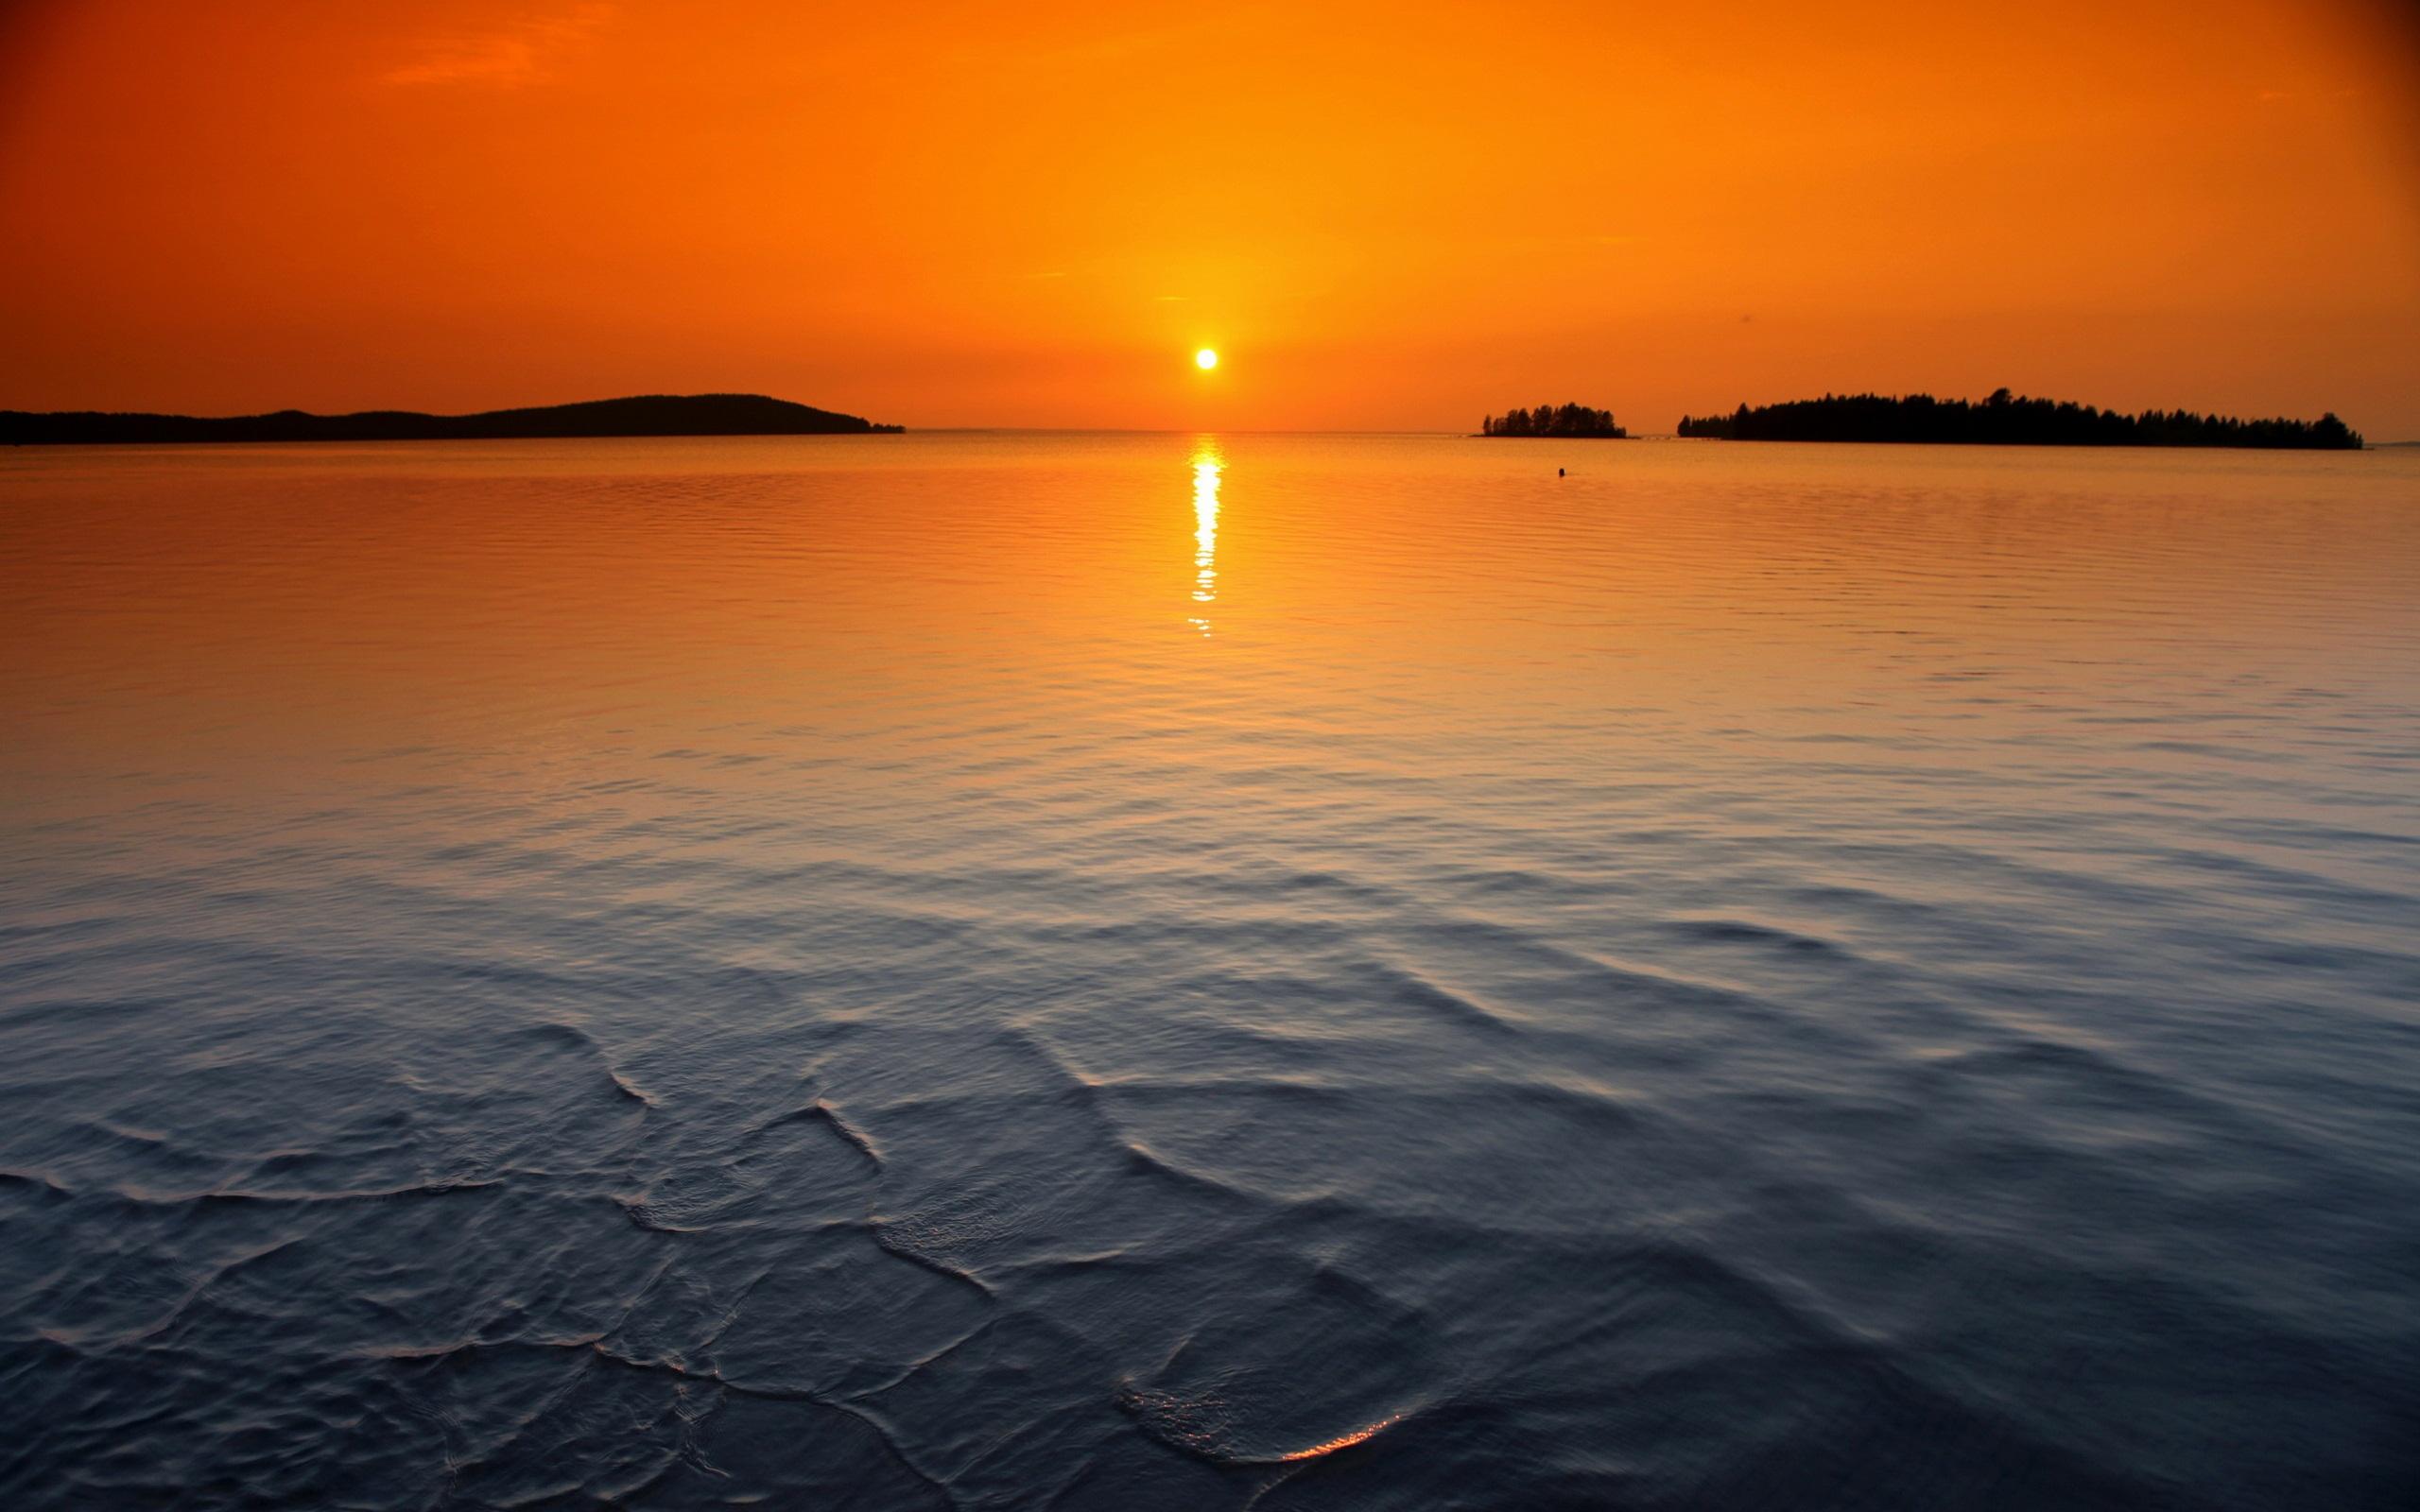 40+ Ocean Sunsets Wallpaper on WallpaperSafari